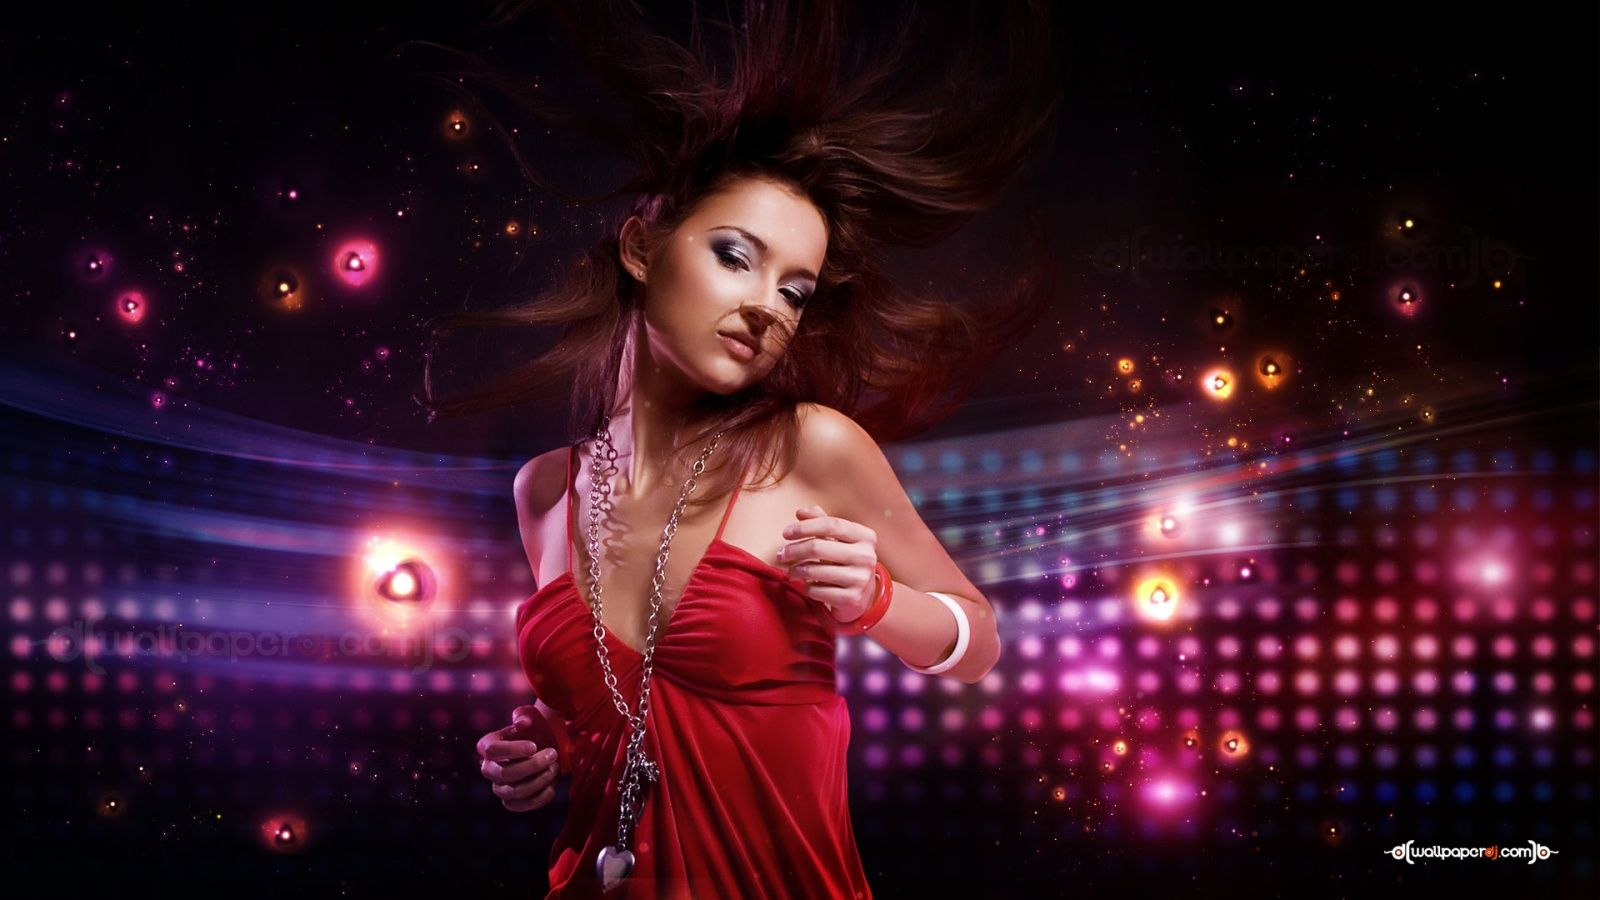 Light up girl dance club 1600 900 - Club lights wallpaper ...